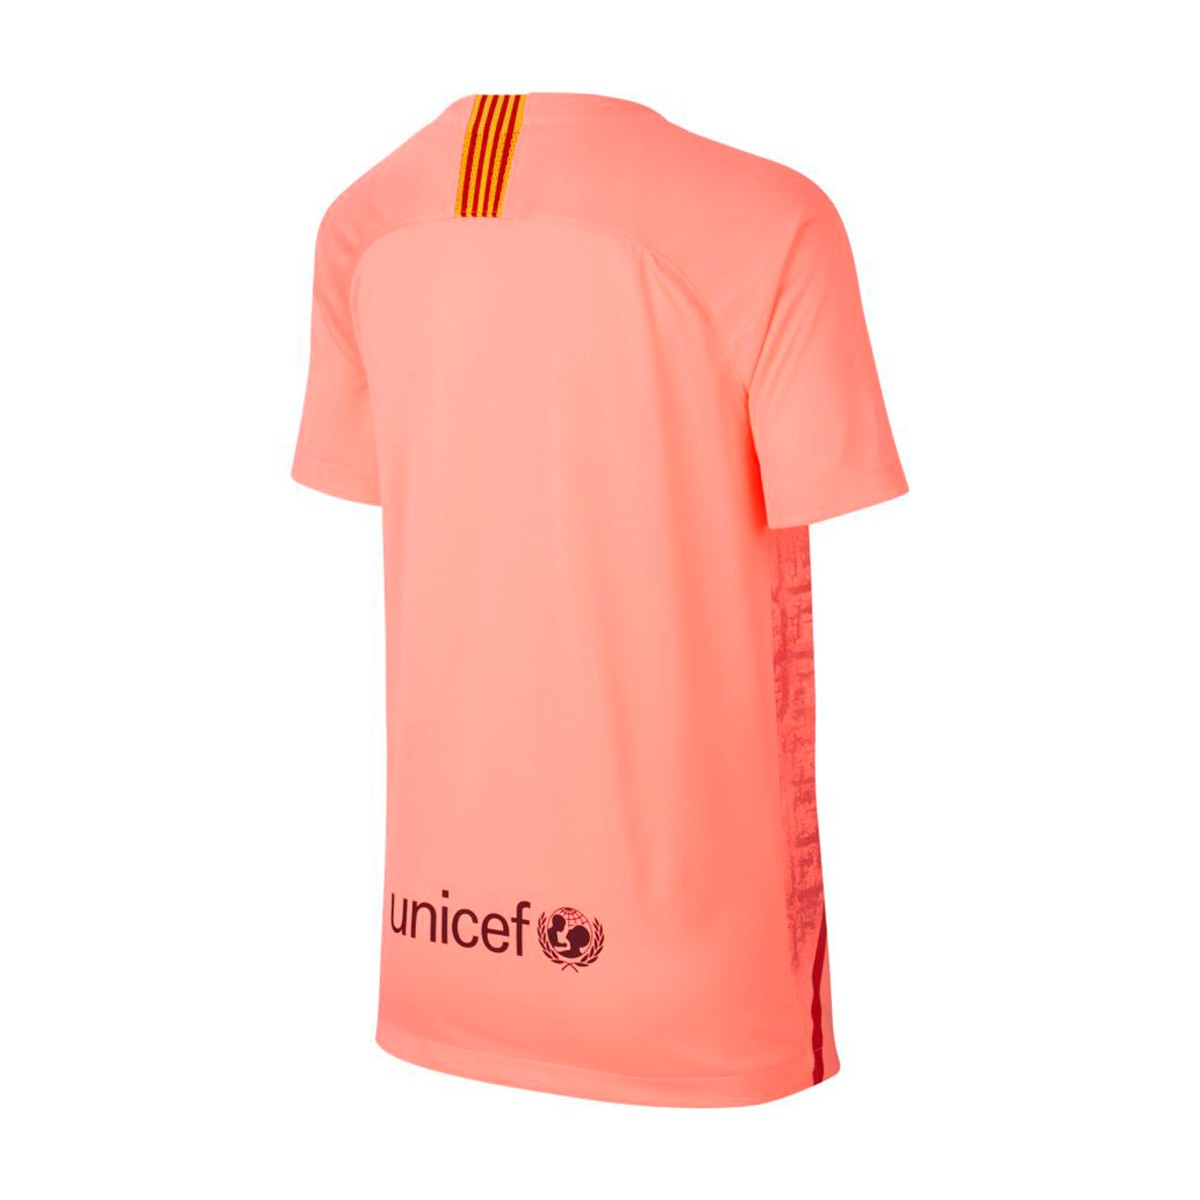 4856760cc44a6 Jersey Nike Kids FC Barcelona Stadium 2018-2019 Third Light atomic  pink-Silver - Leaked soccer